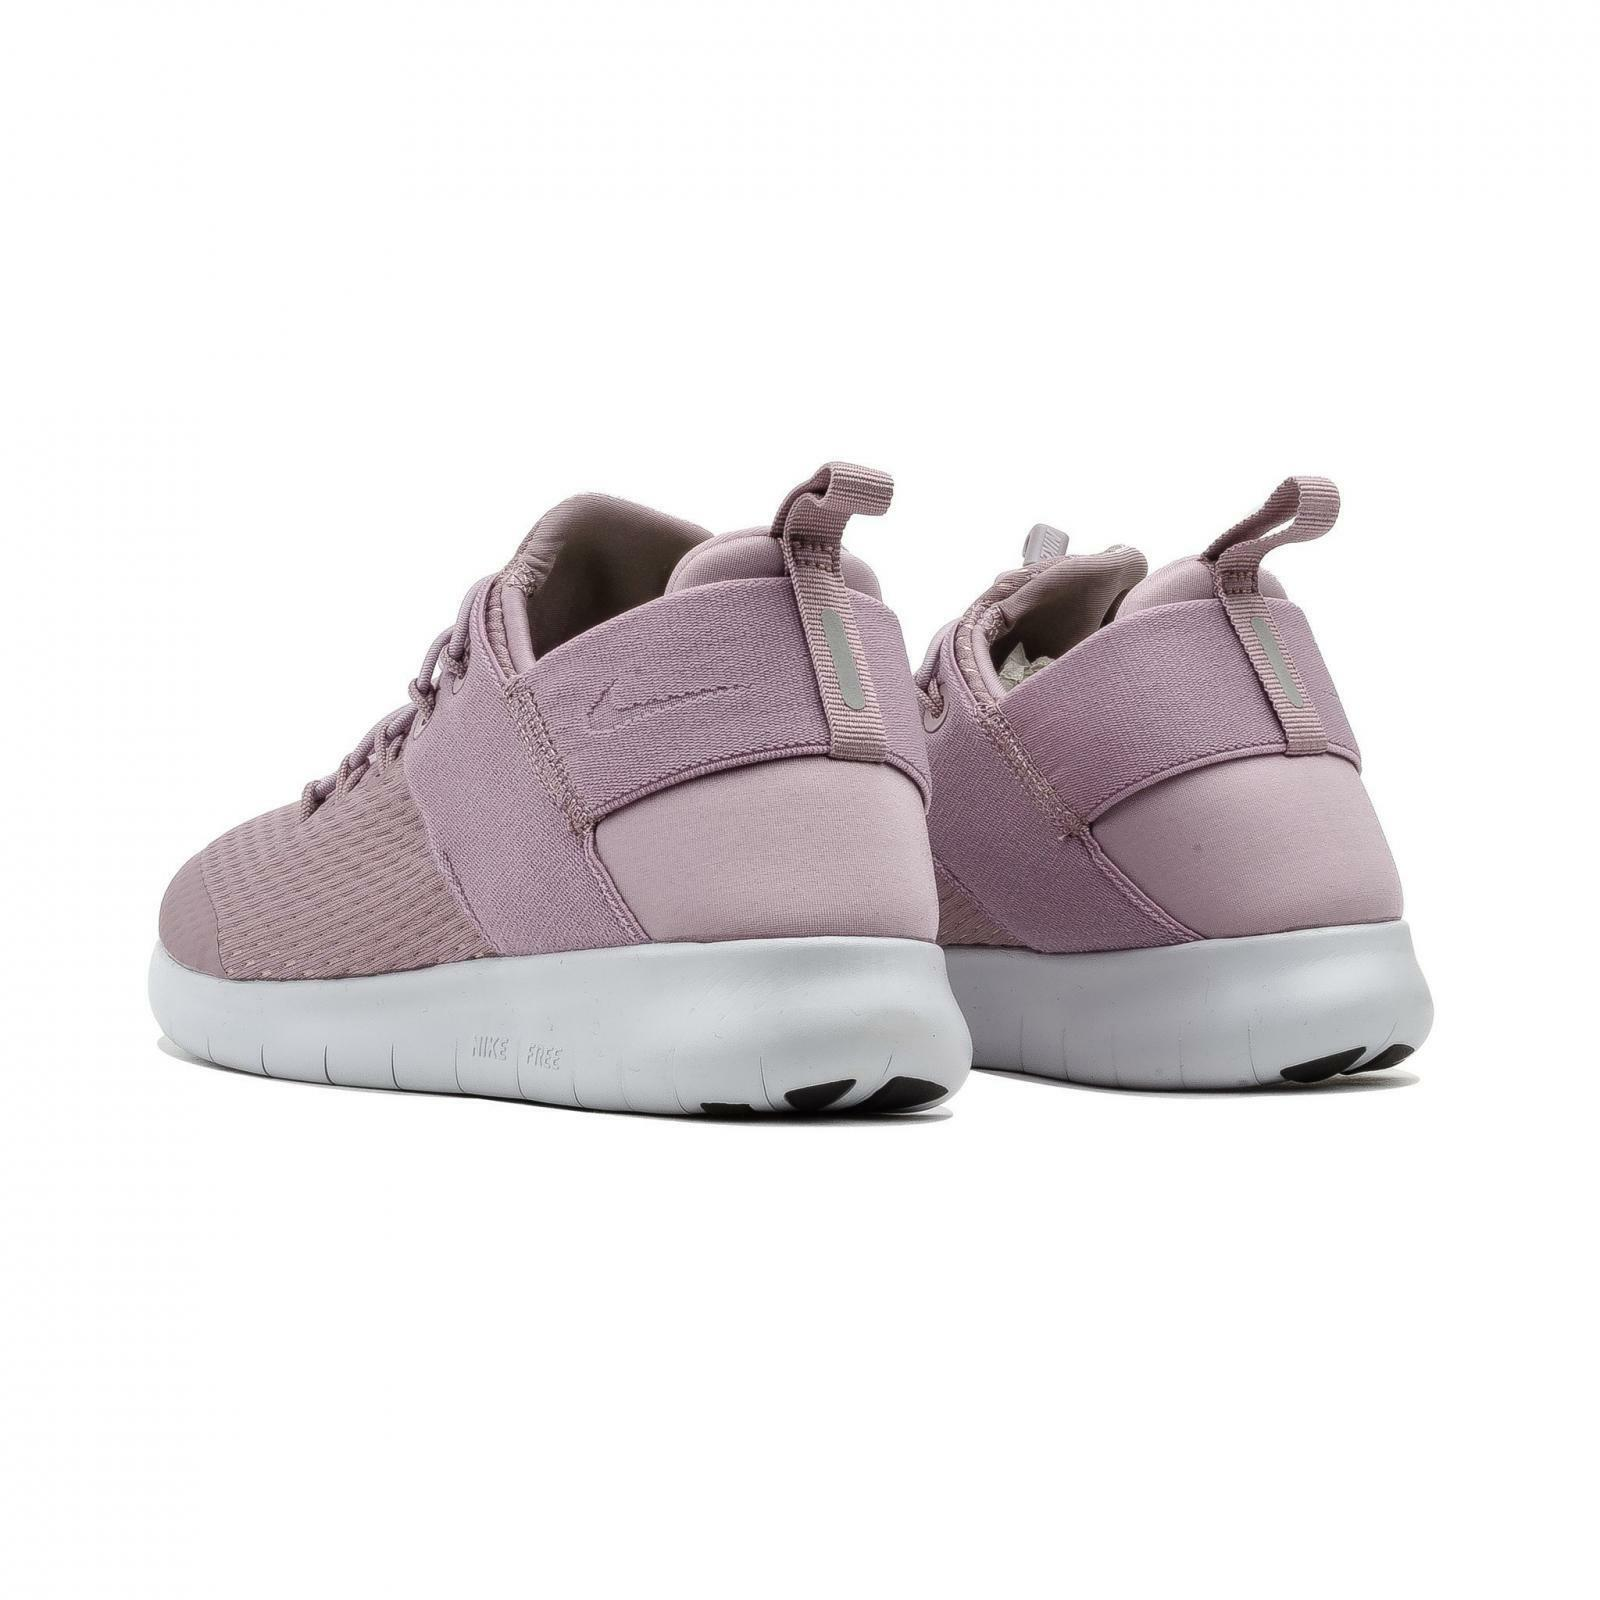 mujer Nike Zapatillas Free RN CMTR 2018 Ciruela Niebla Zapatillas Nike running 880842 500 484f6e